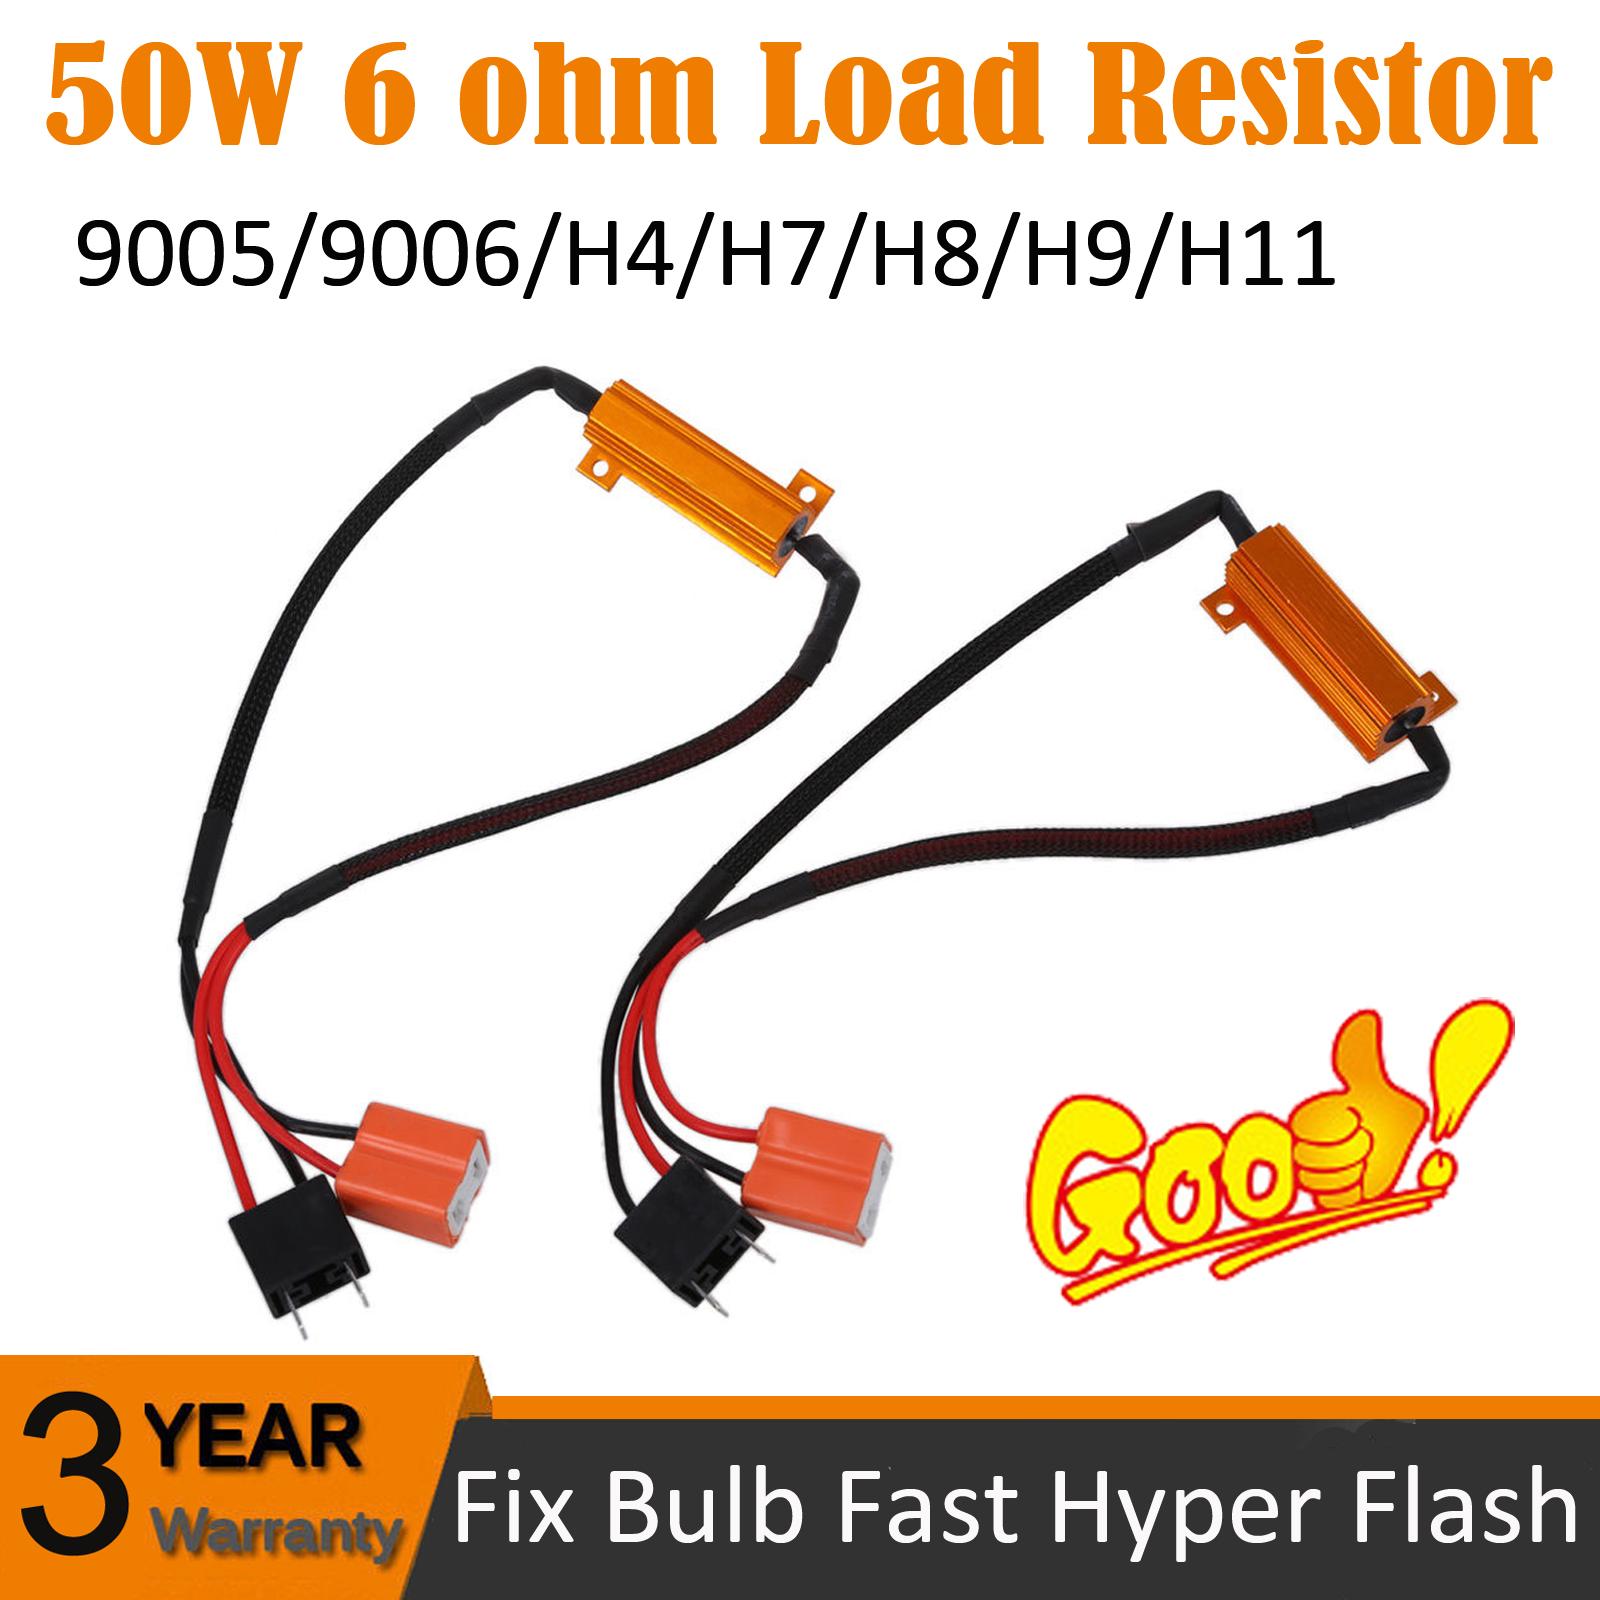 9005 9006 Led Drl Fog Light Canbus 6ohm Load Resistor Wiring Canceller Decoder